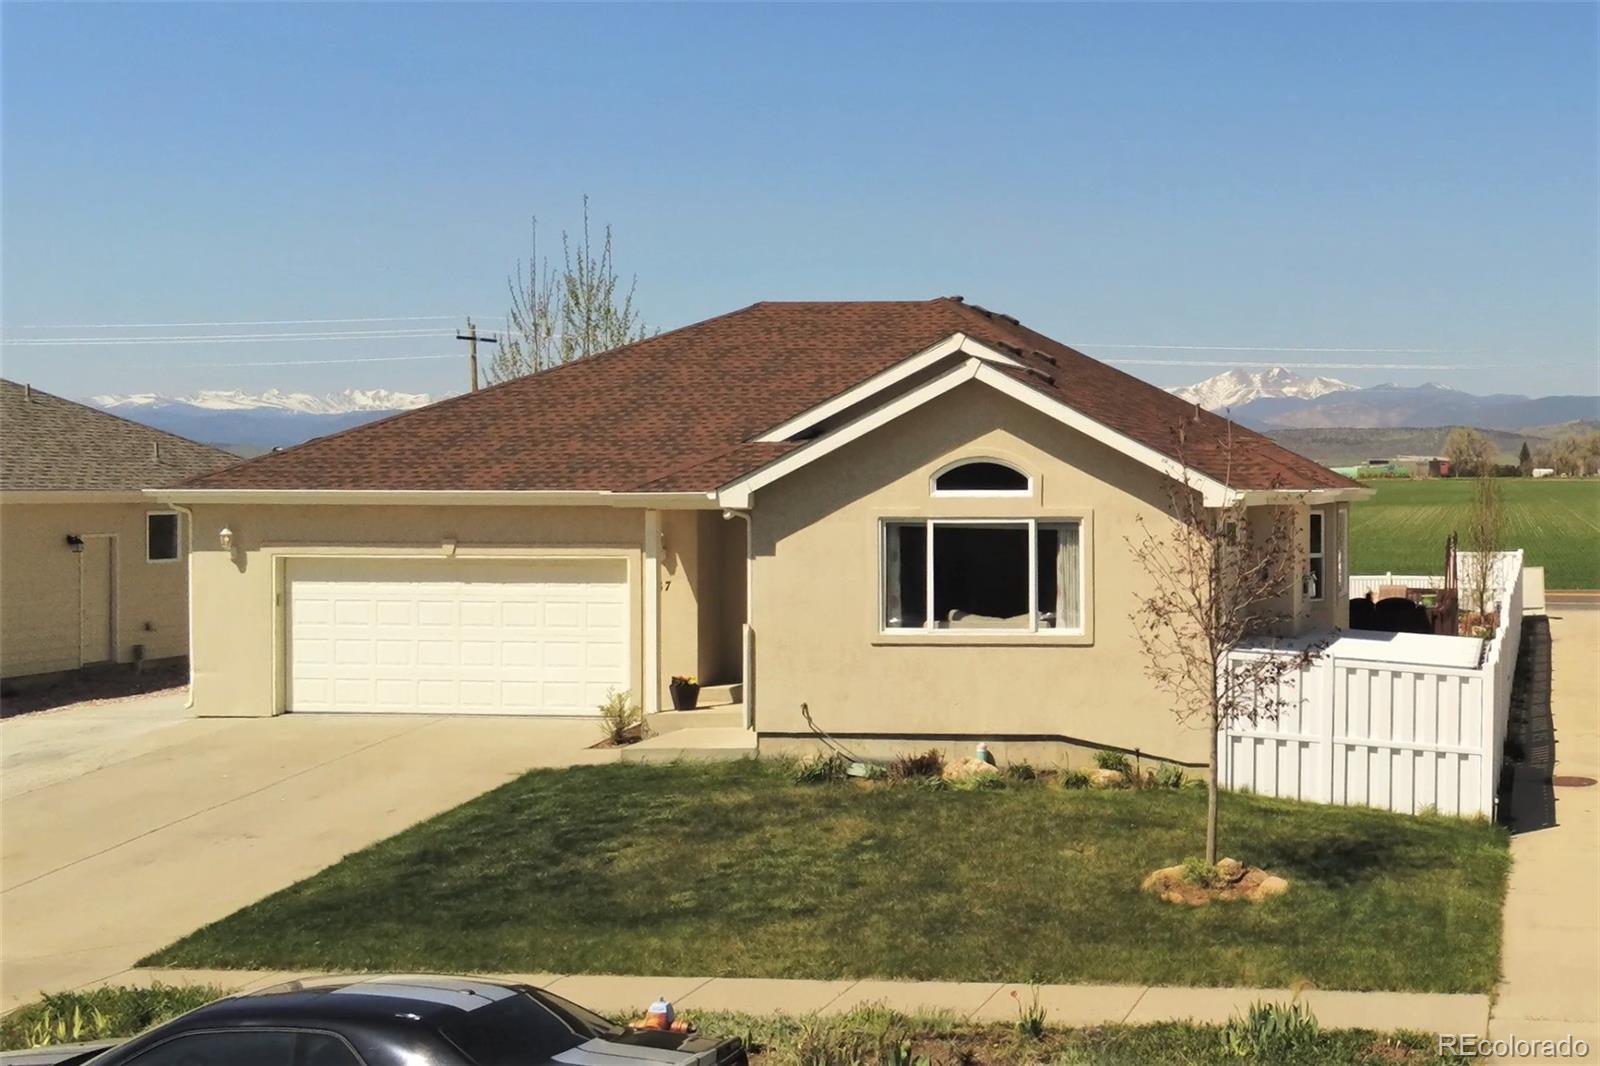 MLS# 1512509 - 1 - 87 Sioux Drive, Berthoud, CO 80513